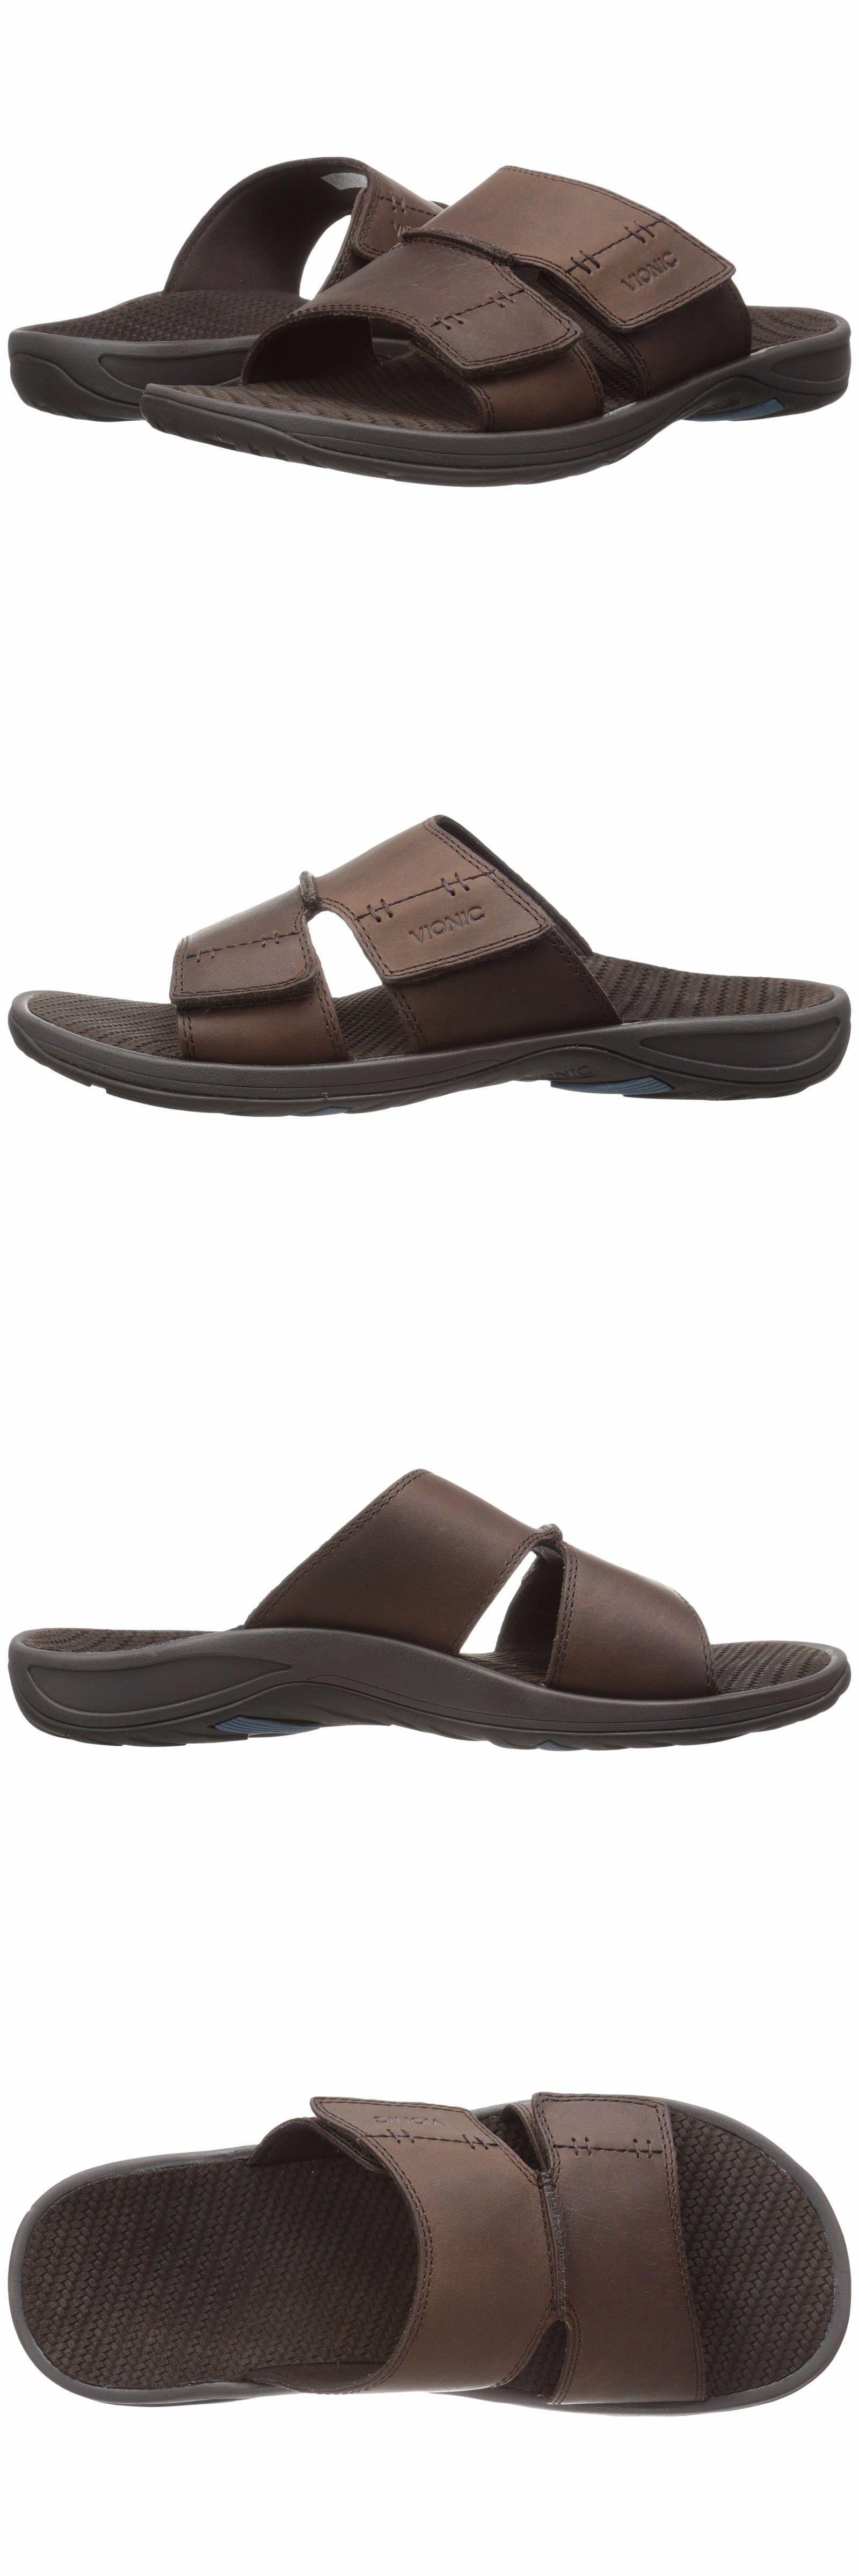 98c7ed3a593e Sandals and Flip Flops 11504  Vionic Men S Jon Orthaheel Slide Sandals